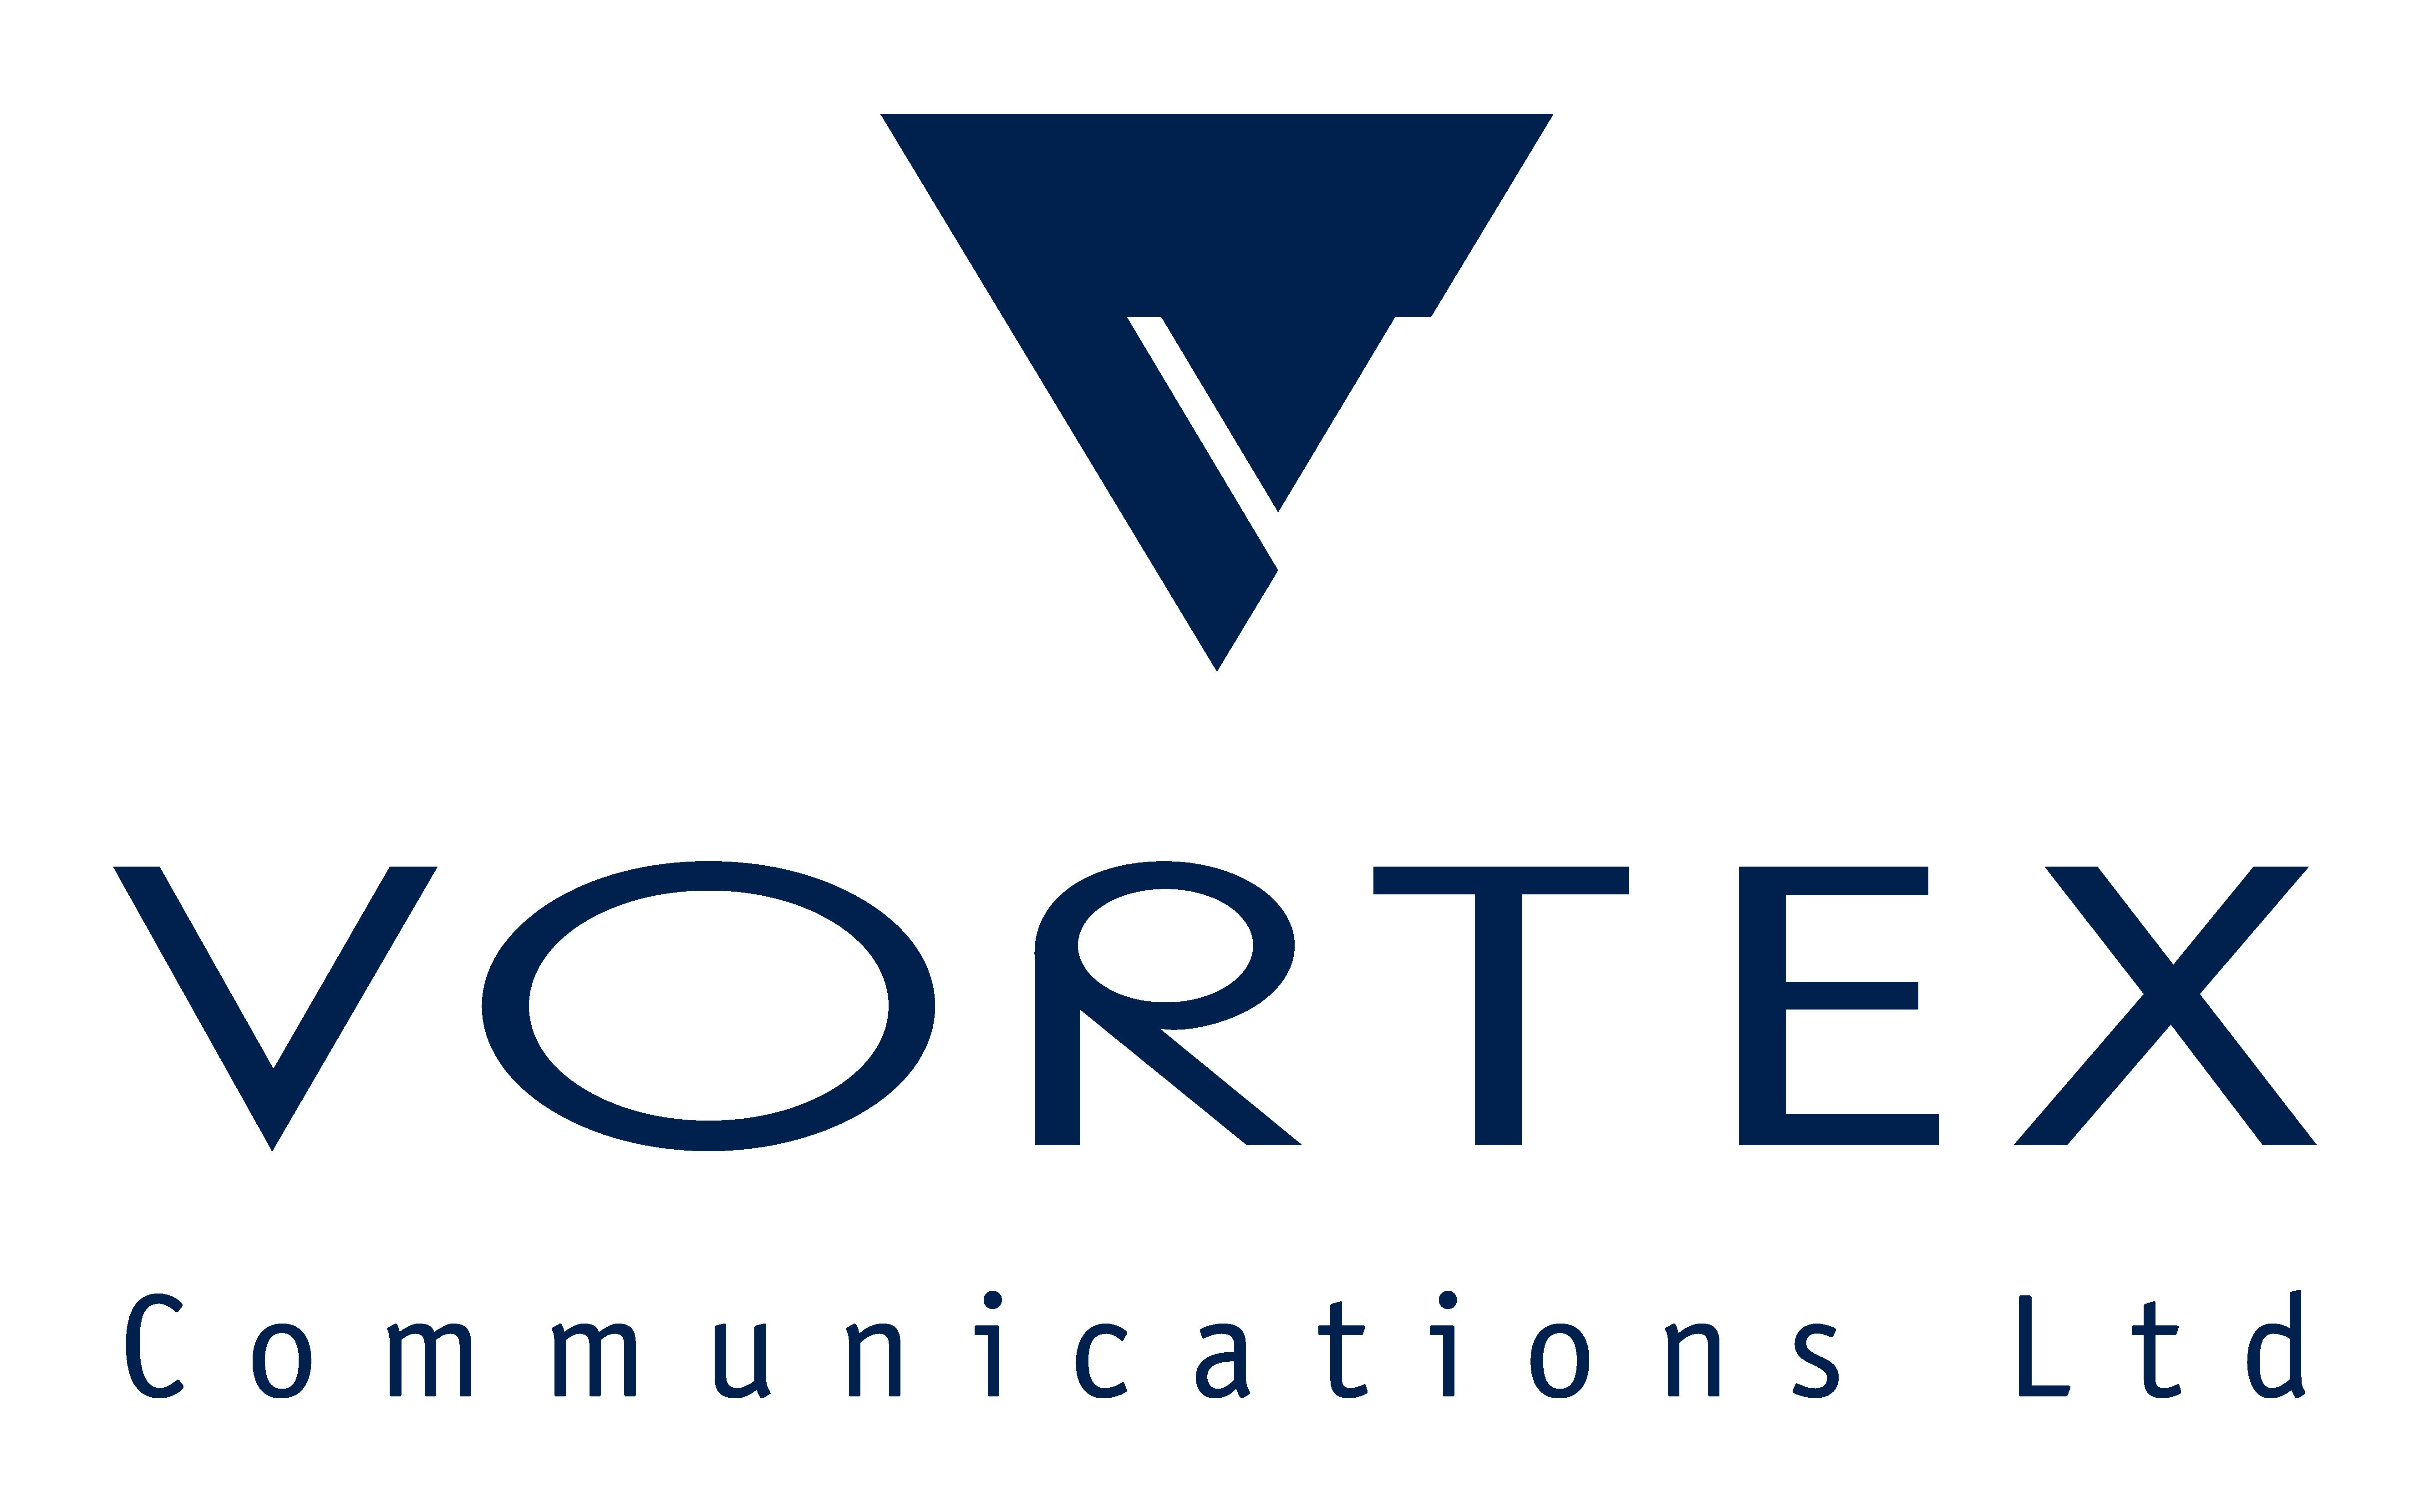 Vortex Communications logo